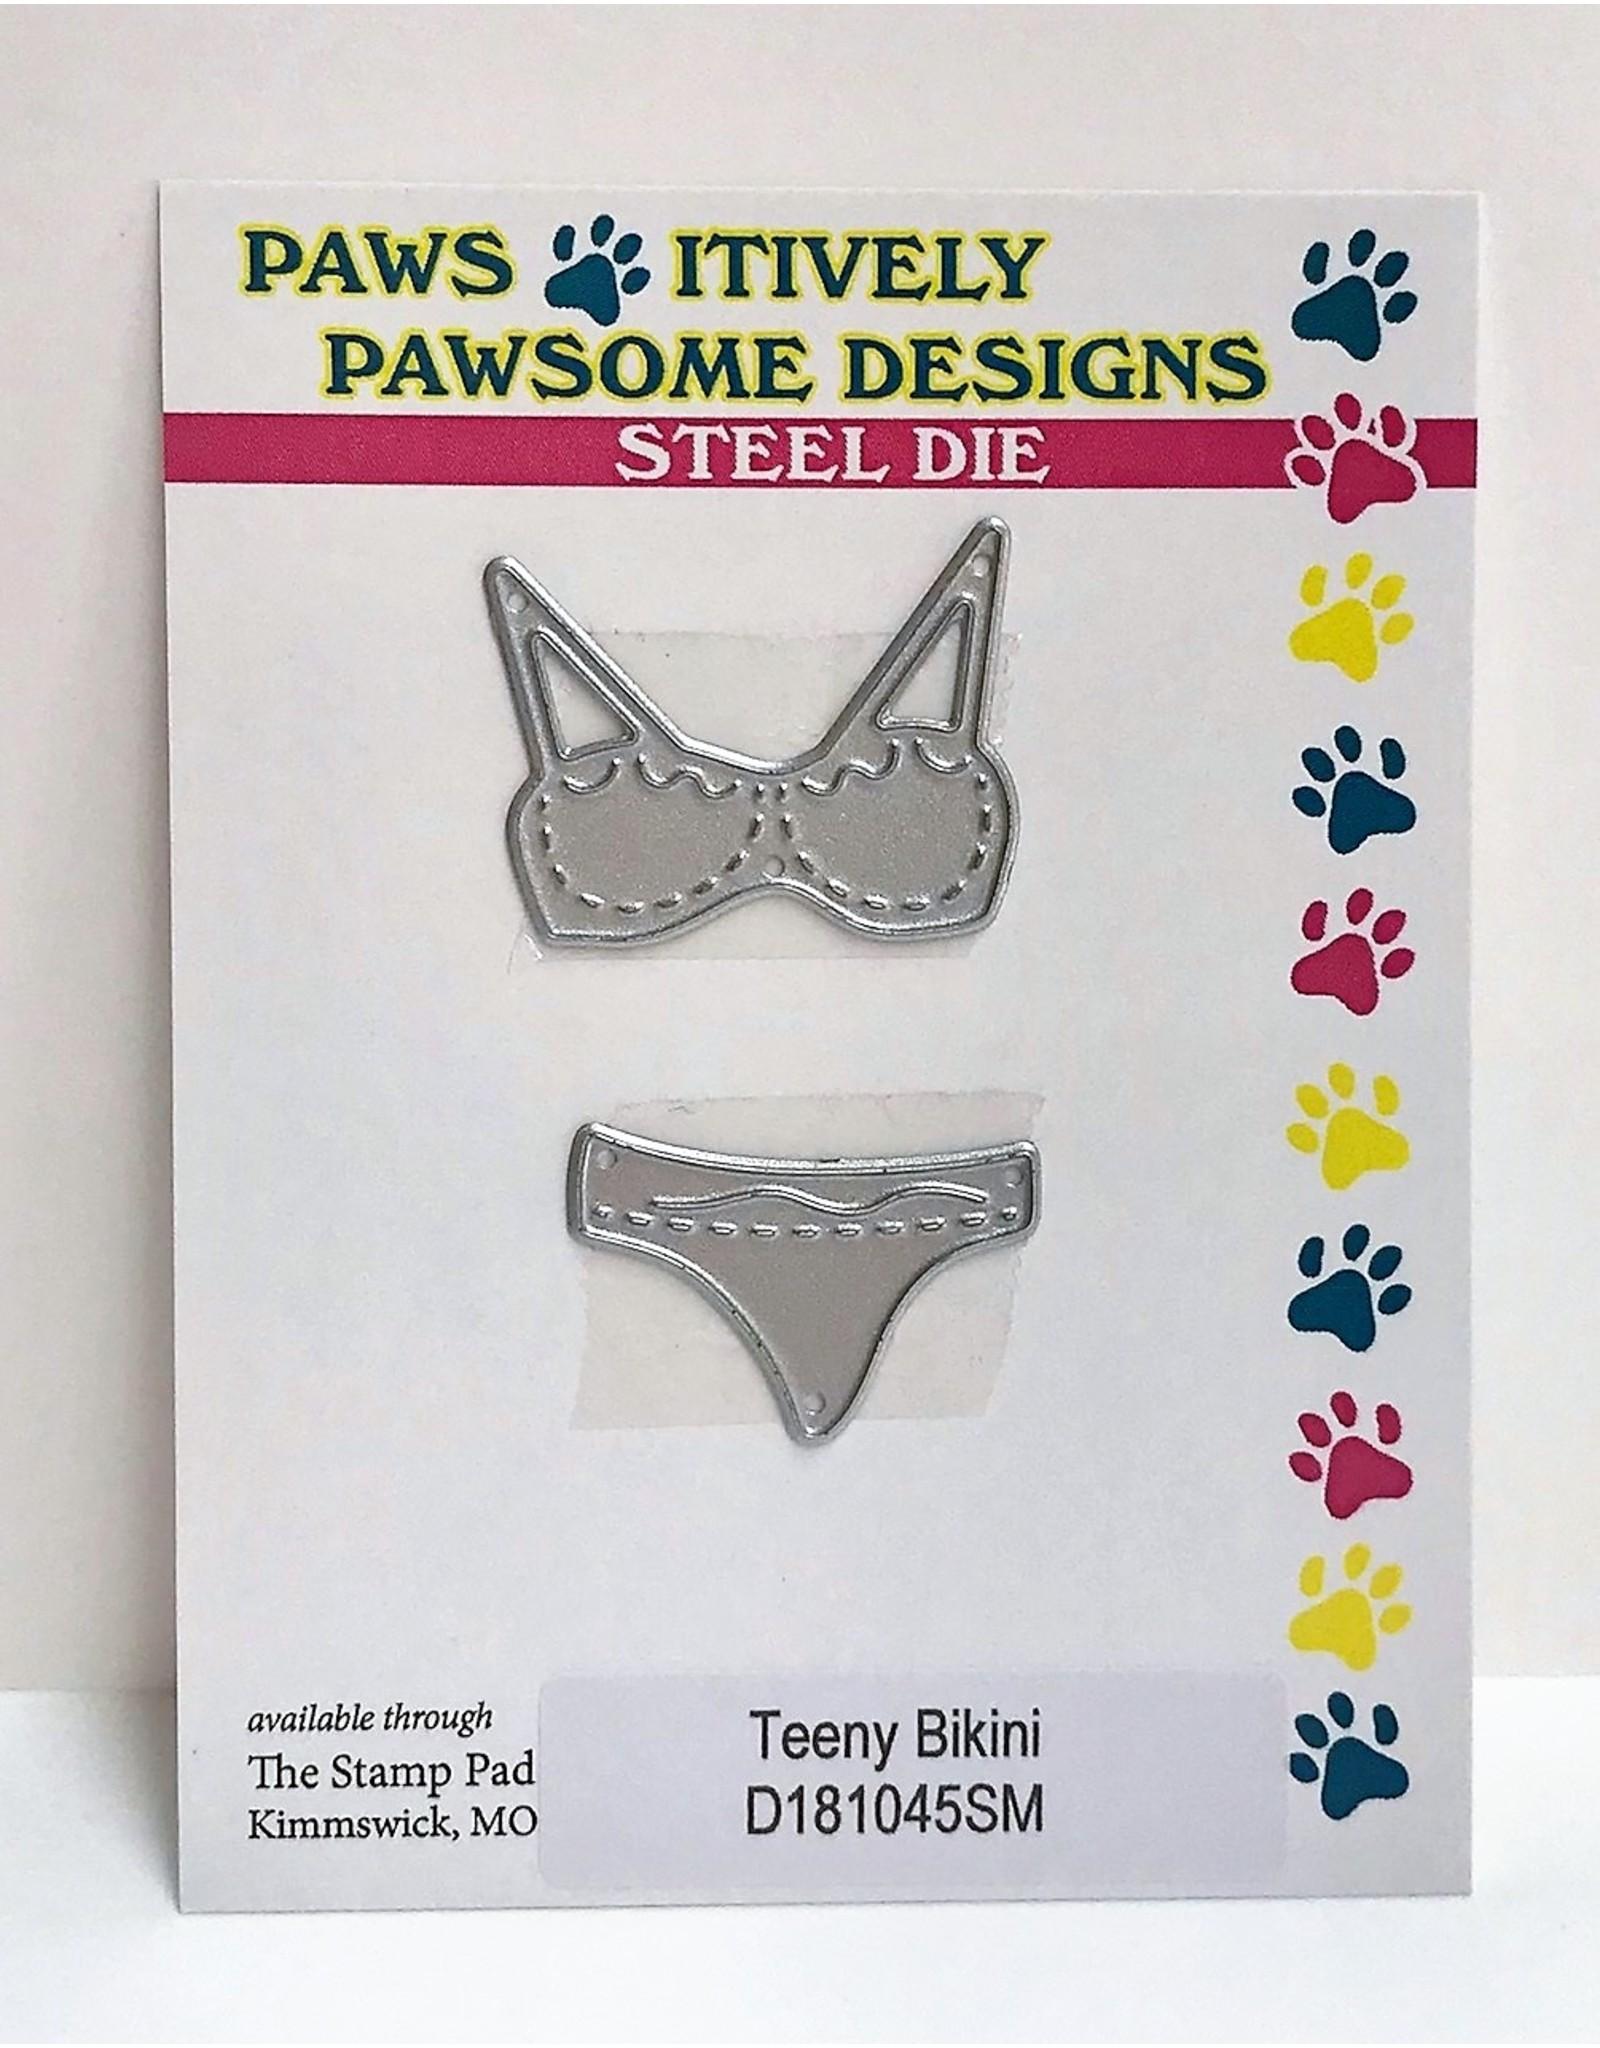 Paws-Itively Pawsome Designs Teeny Bikini - Die